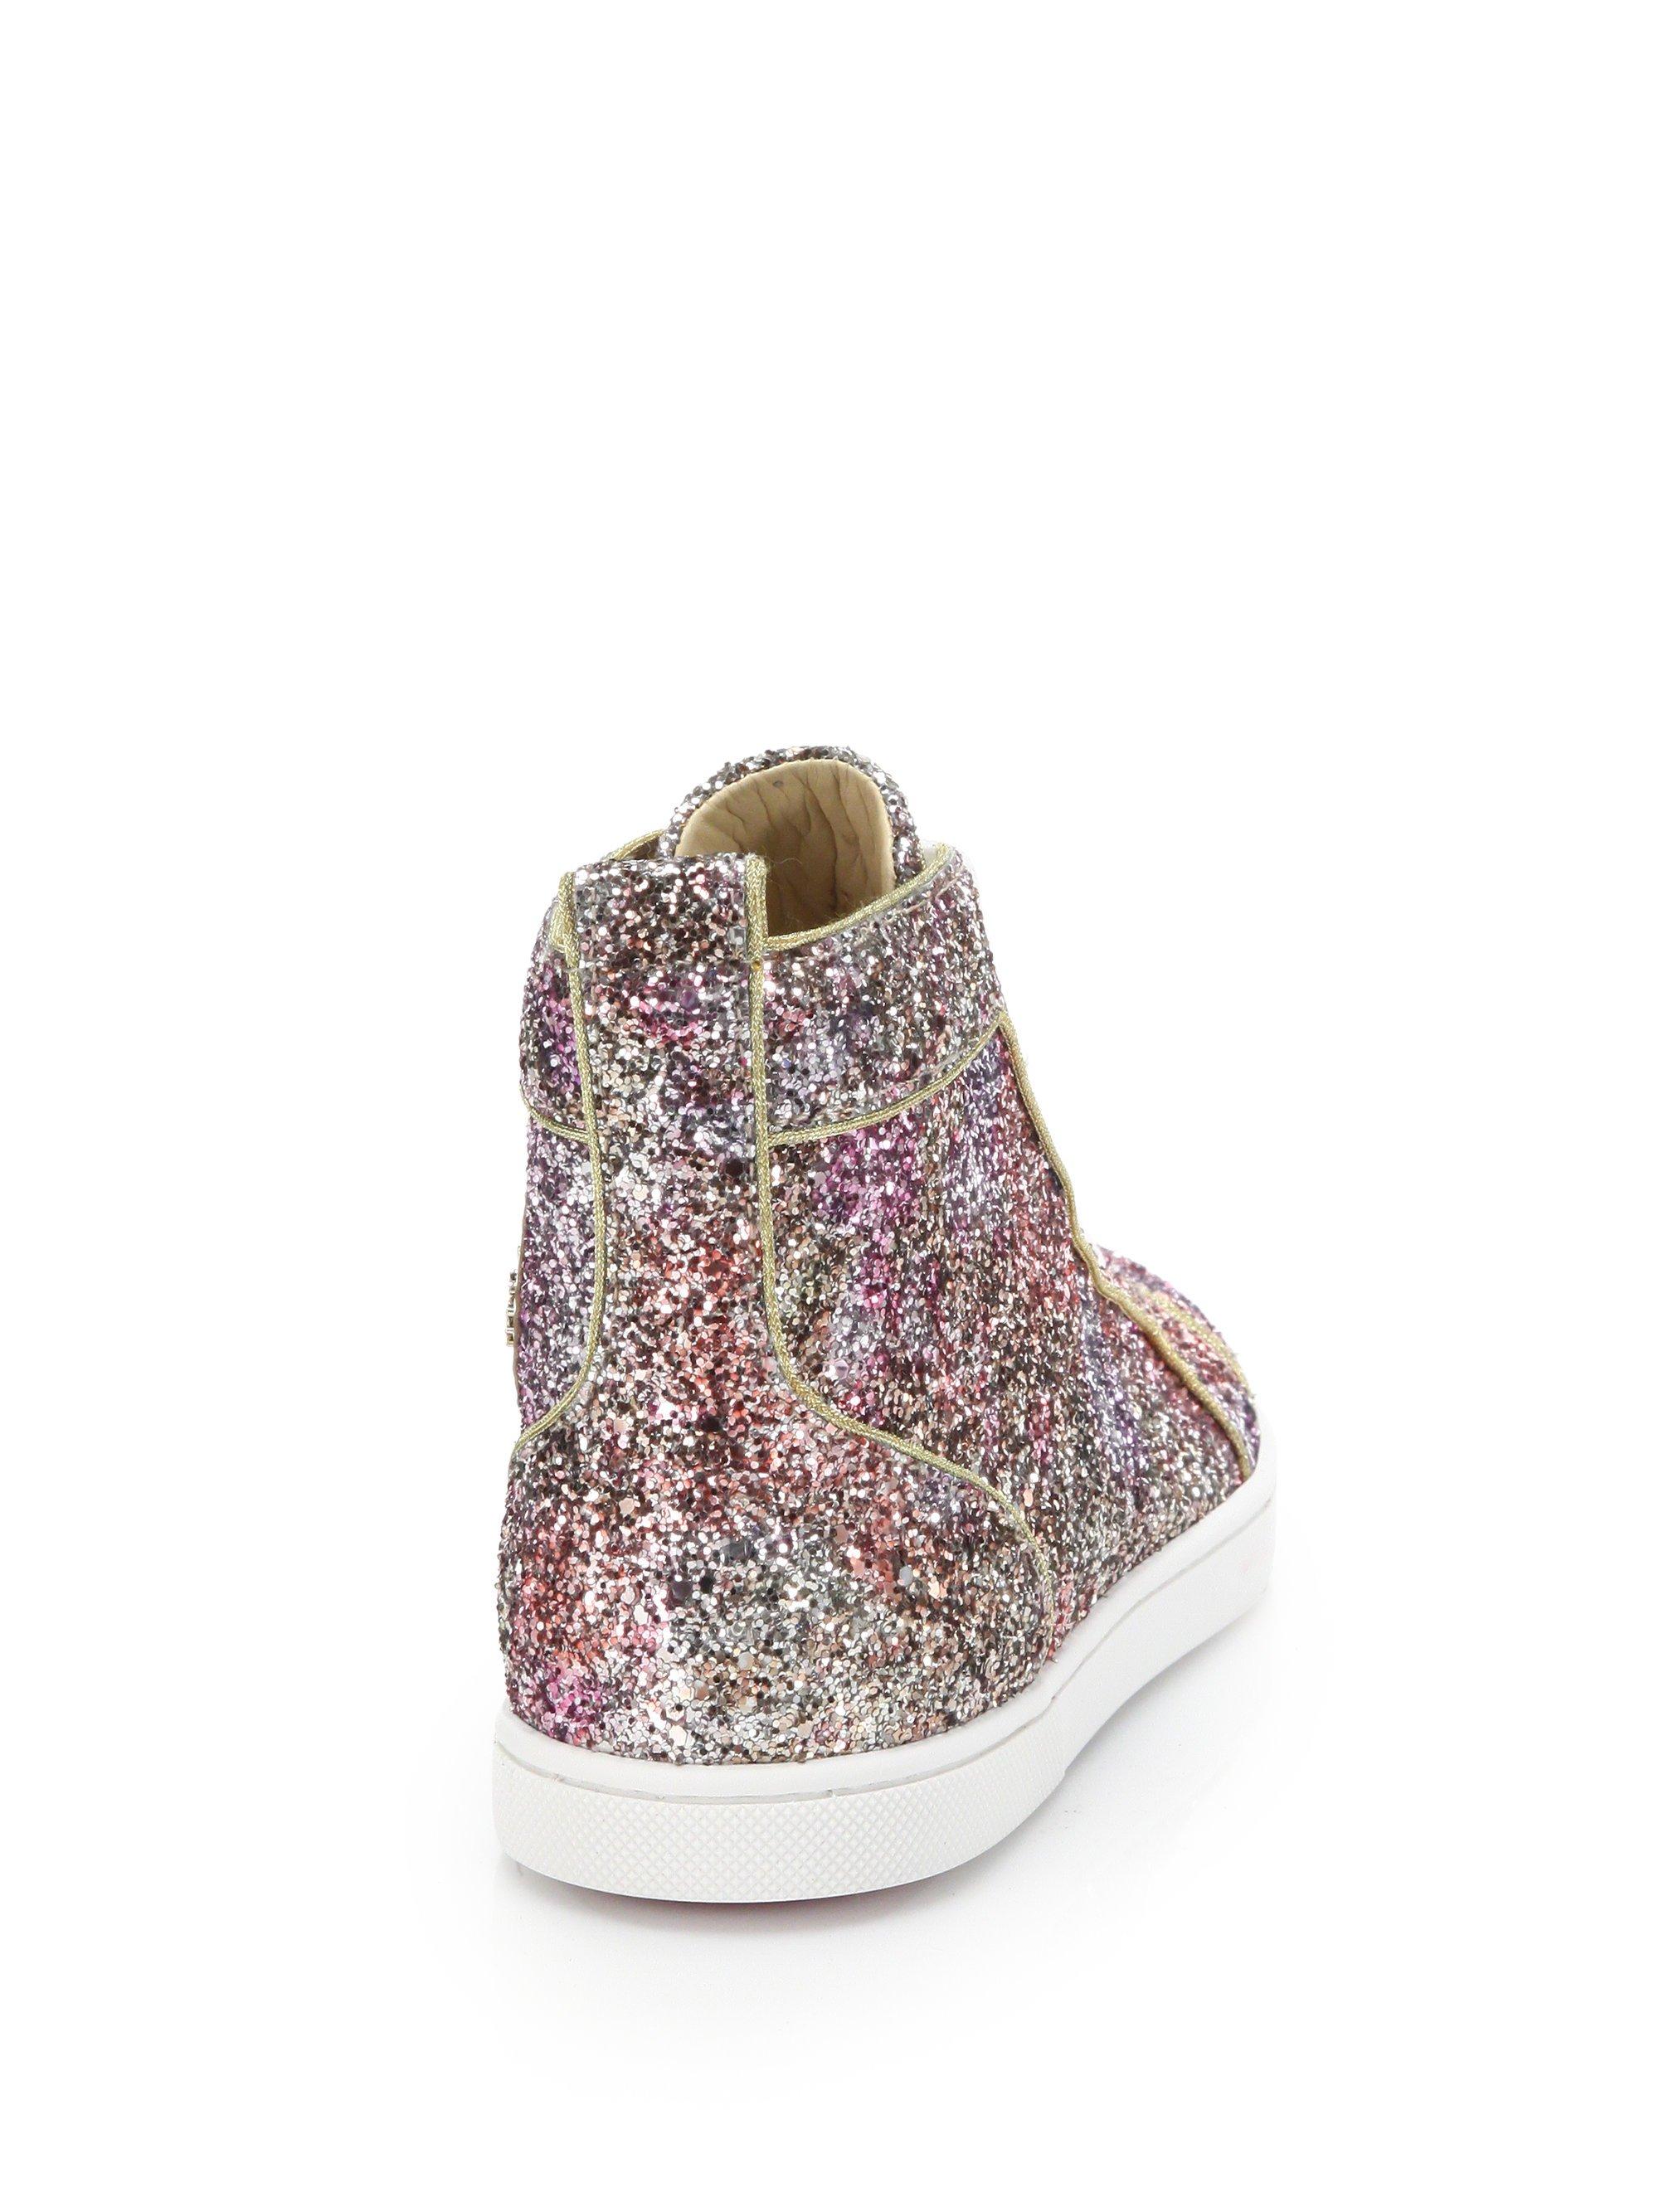 6ae0e1584db Christian Louboutin Pink Bip Bip Glitter High-top Sneakers